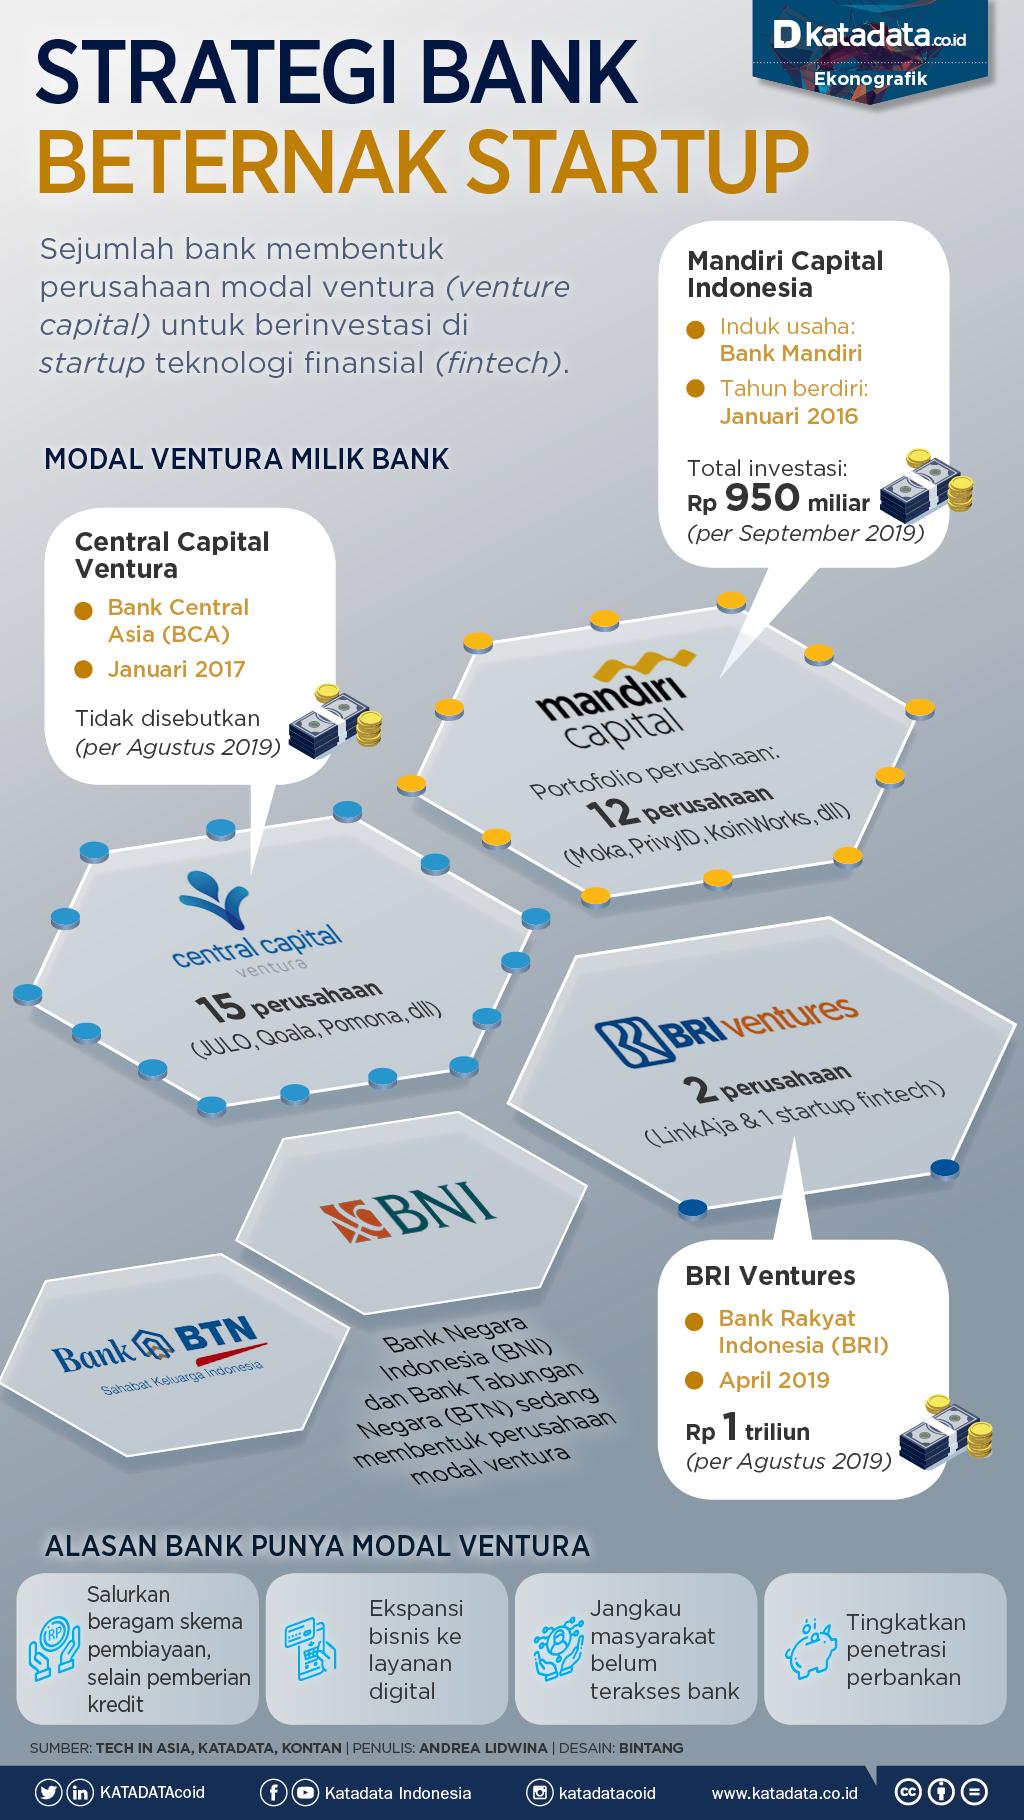 strategi bank beternak startup